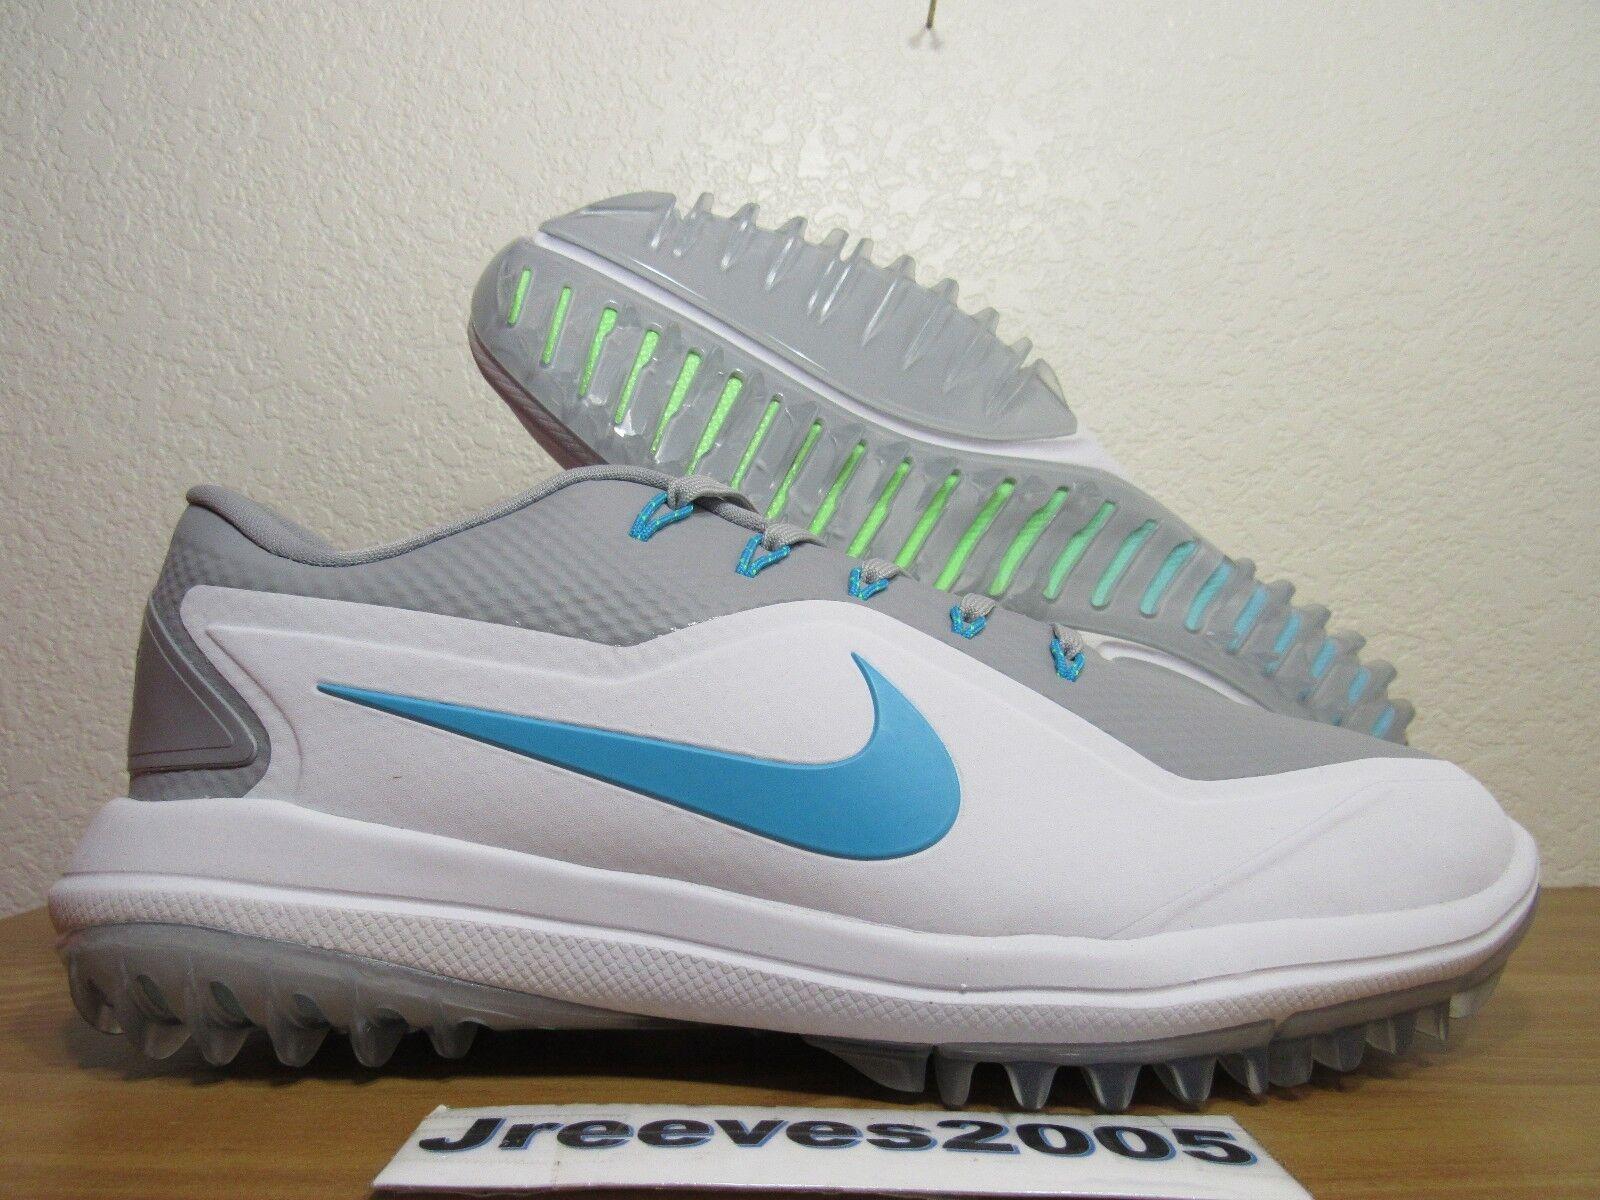 official photos f1386 544a0 Nike Lunar Lunar Lunar Control Vapor 2 Golf Shoes Sz 9 100% Authentic Wolf  Grey 899633 001 b61047